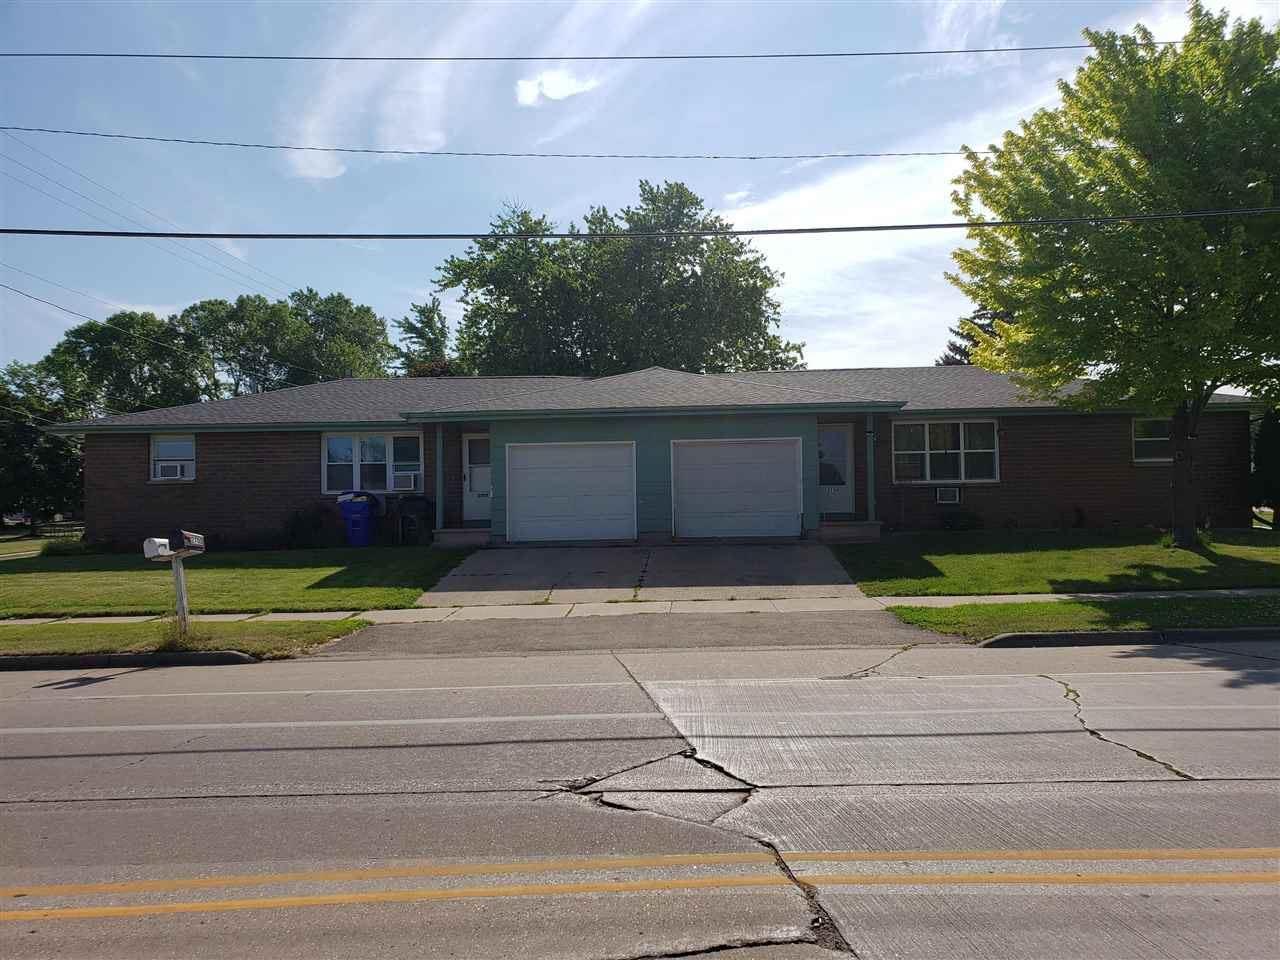 2700 N MASON Street, Appleton, WI 54914 - MLS#: 50241692